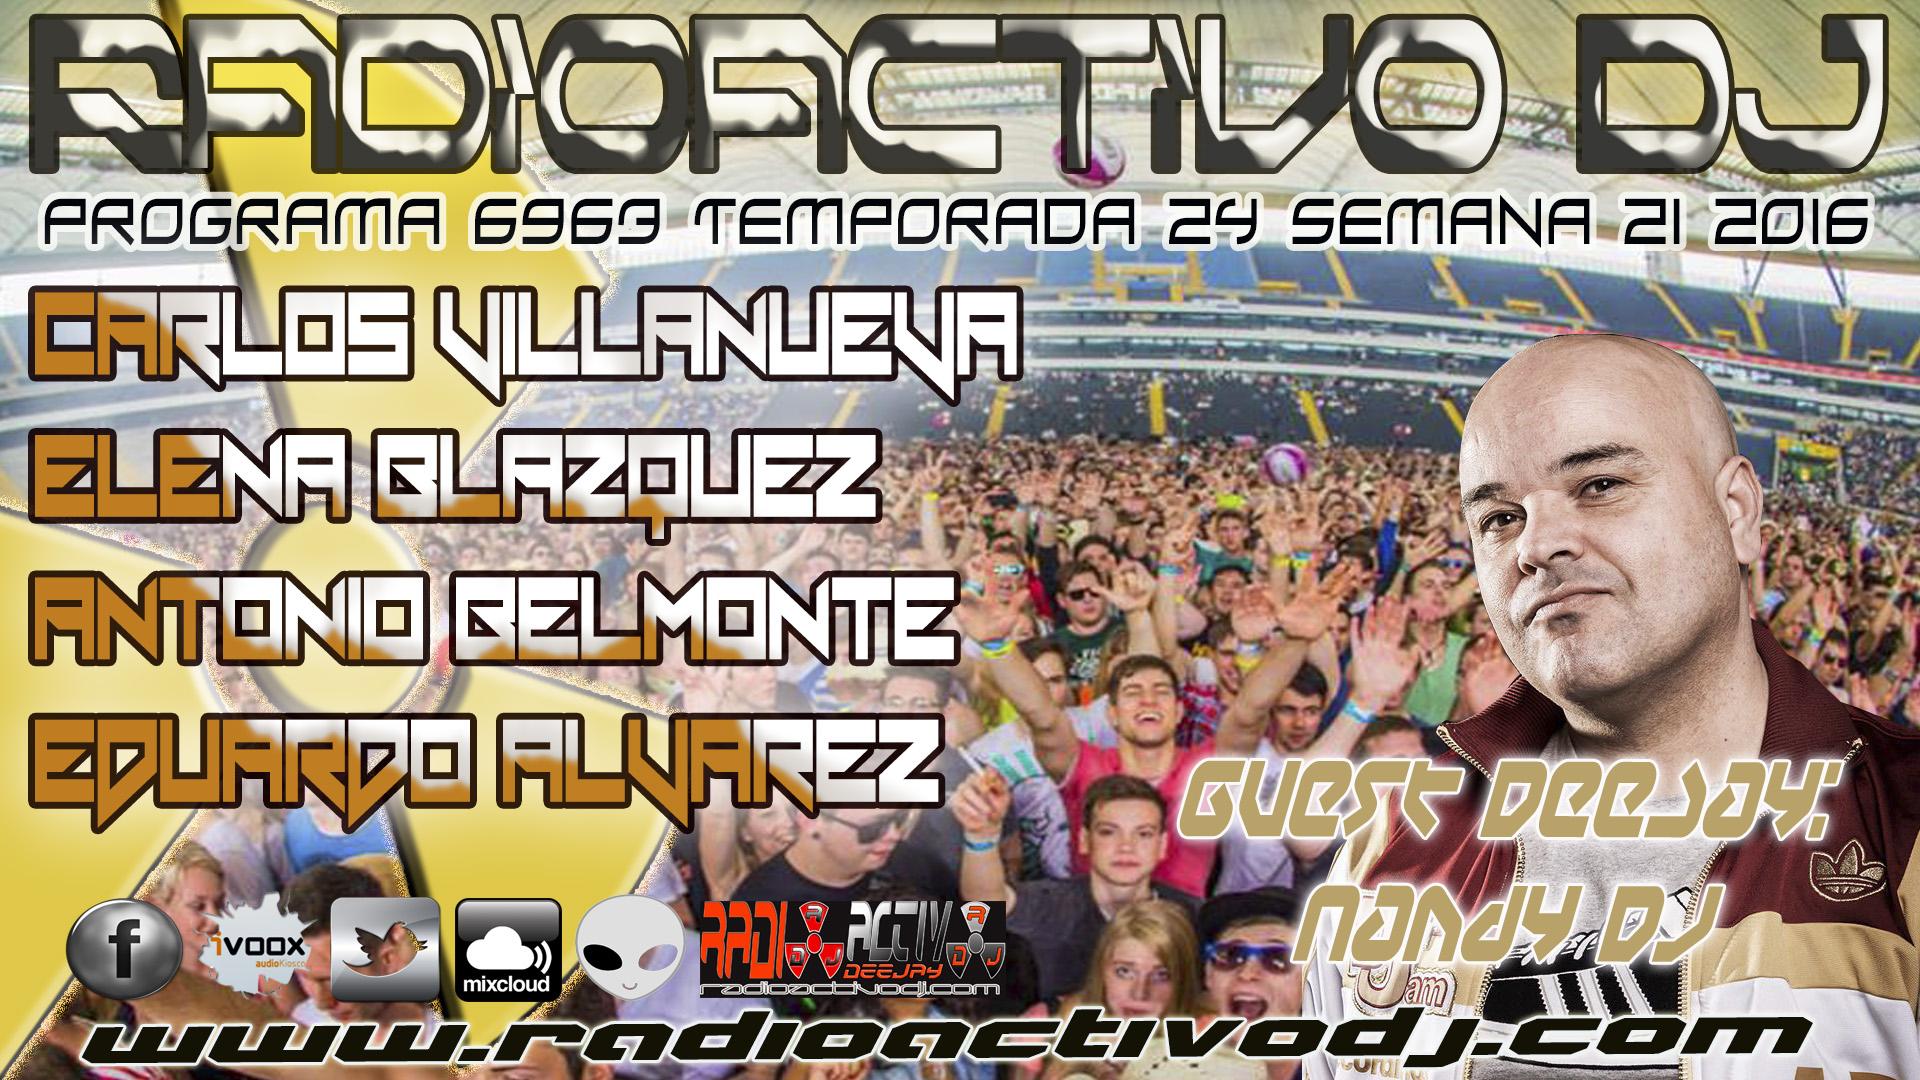 RADIOACTIVO-DJ-21-2016